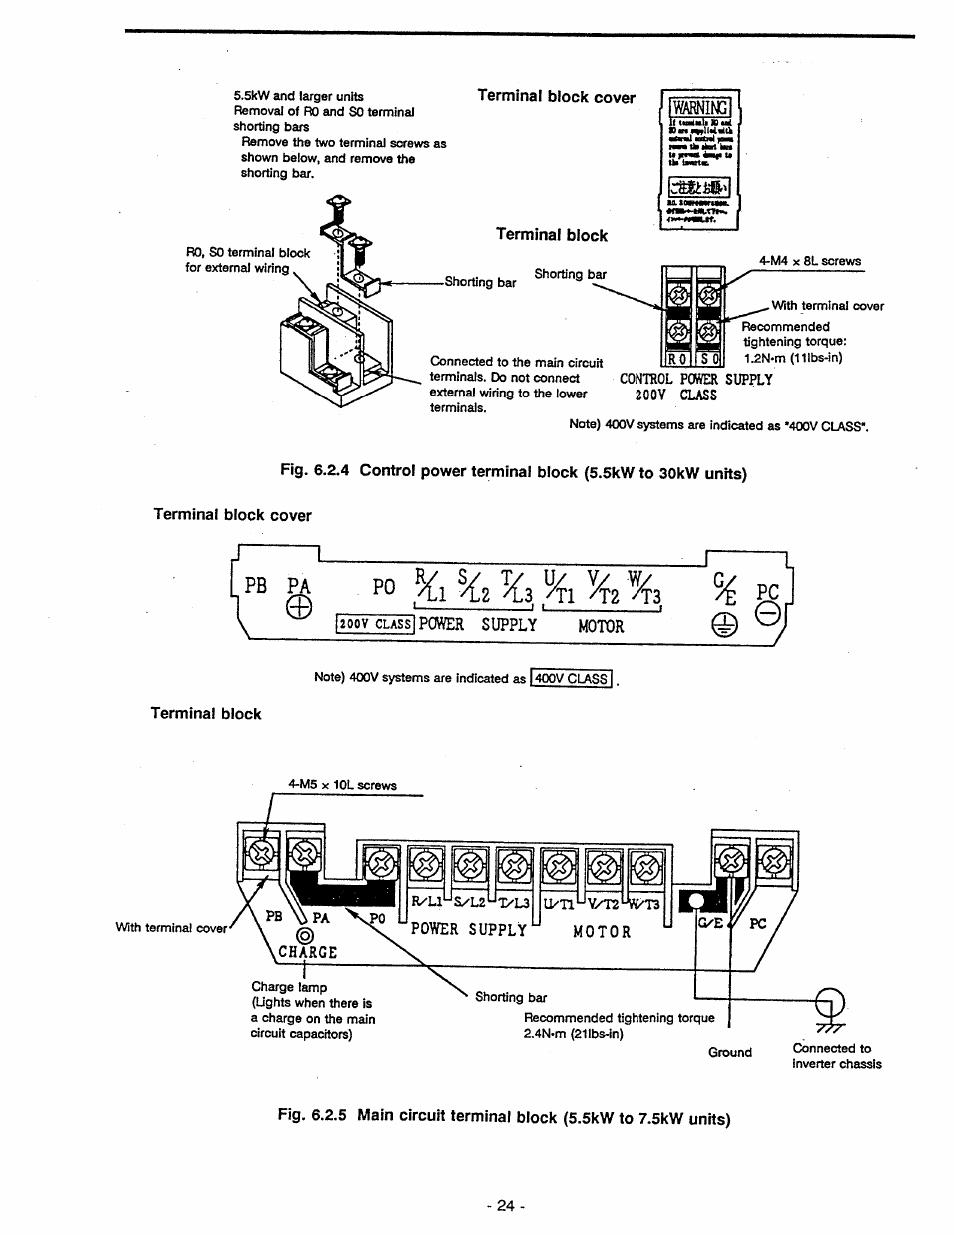 medium resolution of terminal block cover terminal block 200v class power supply motor pb